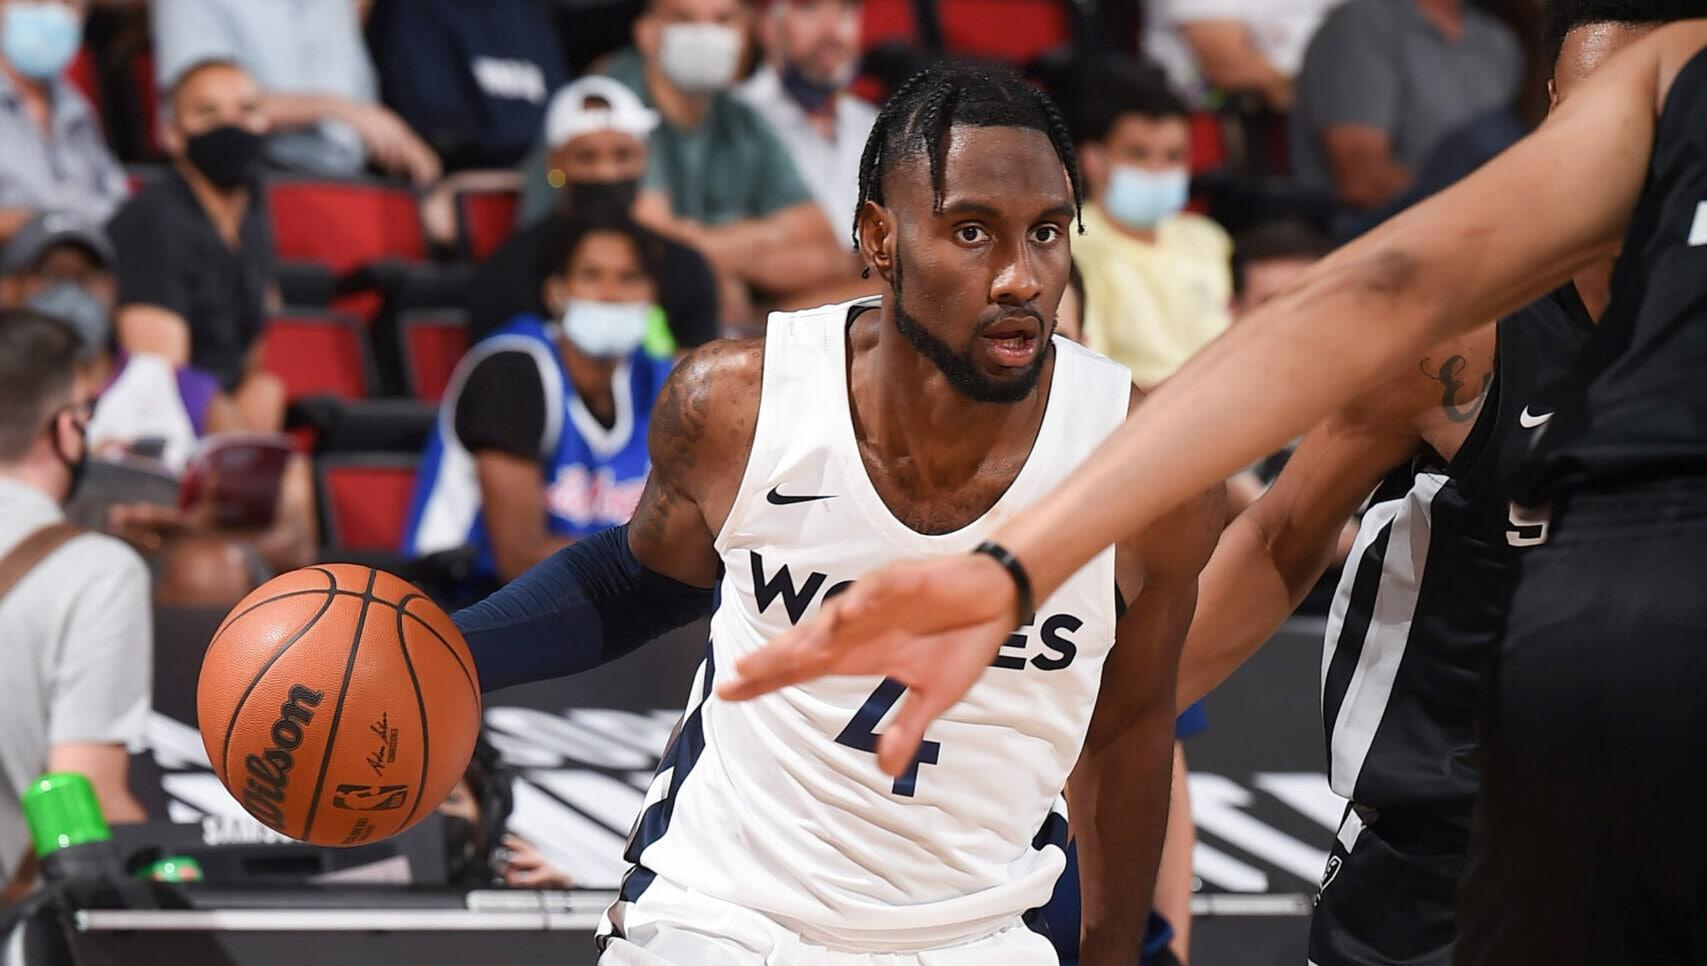 Las Vegas Summer League: Nowell scores 24 to lead Timberwolves